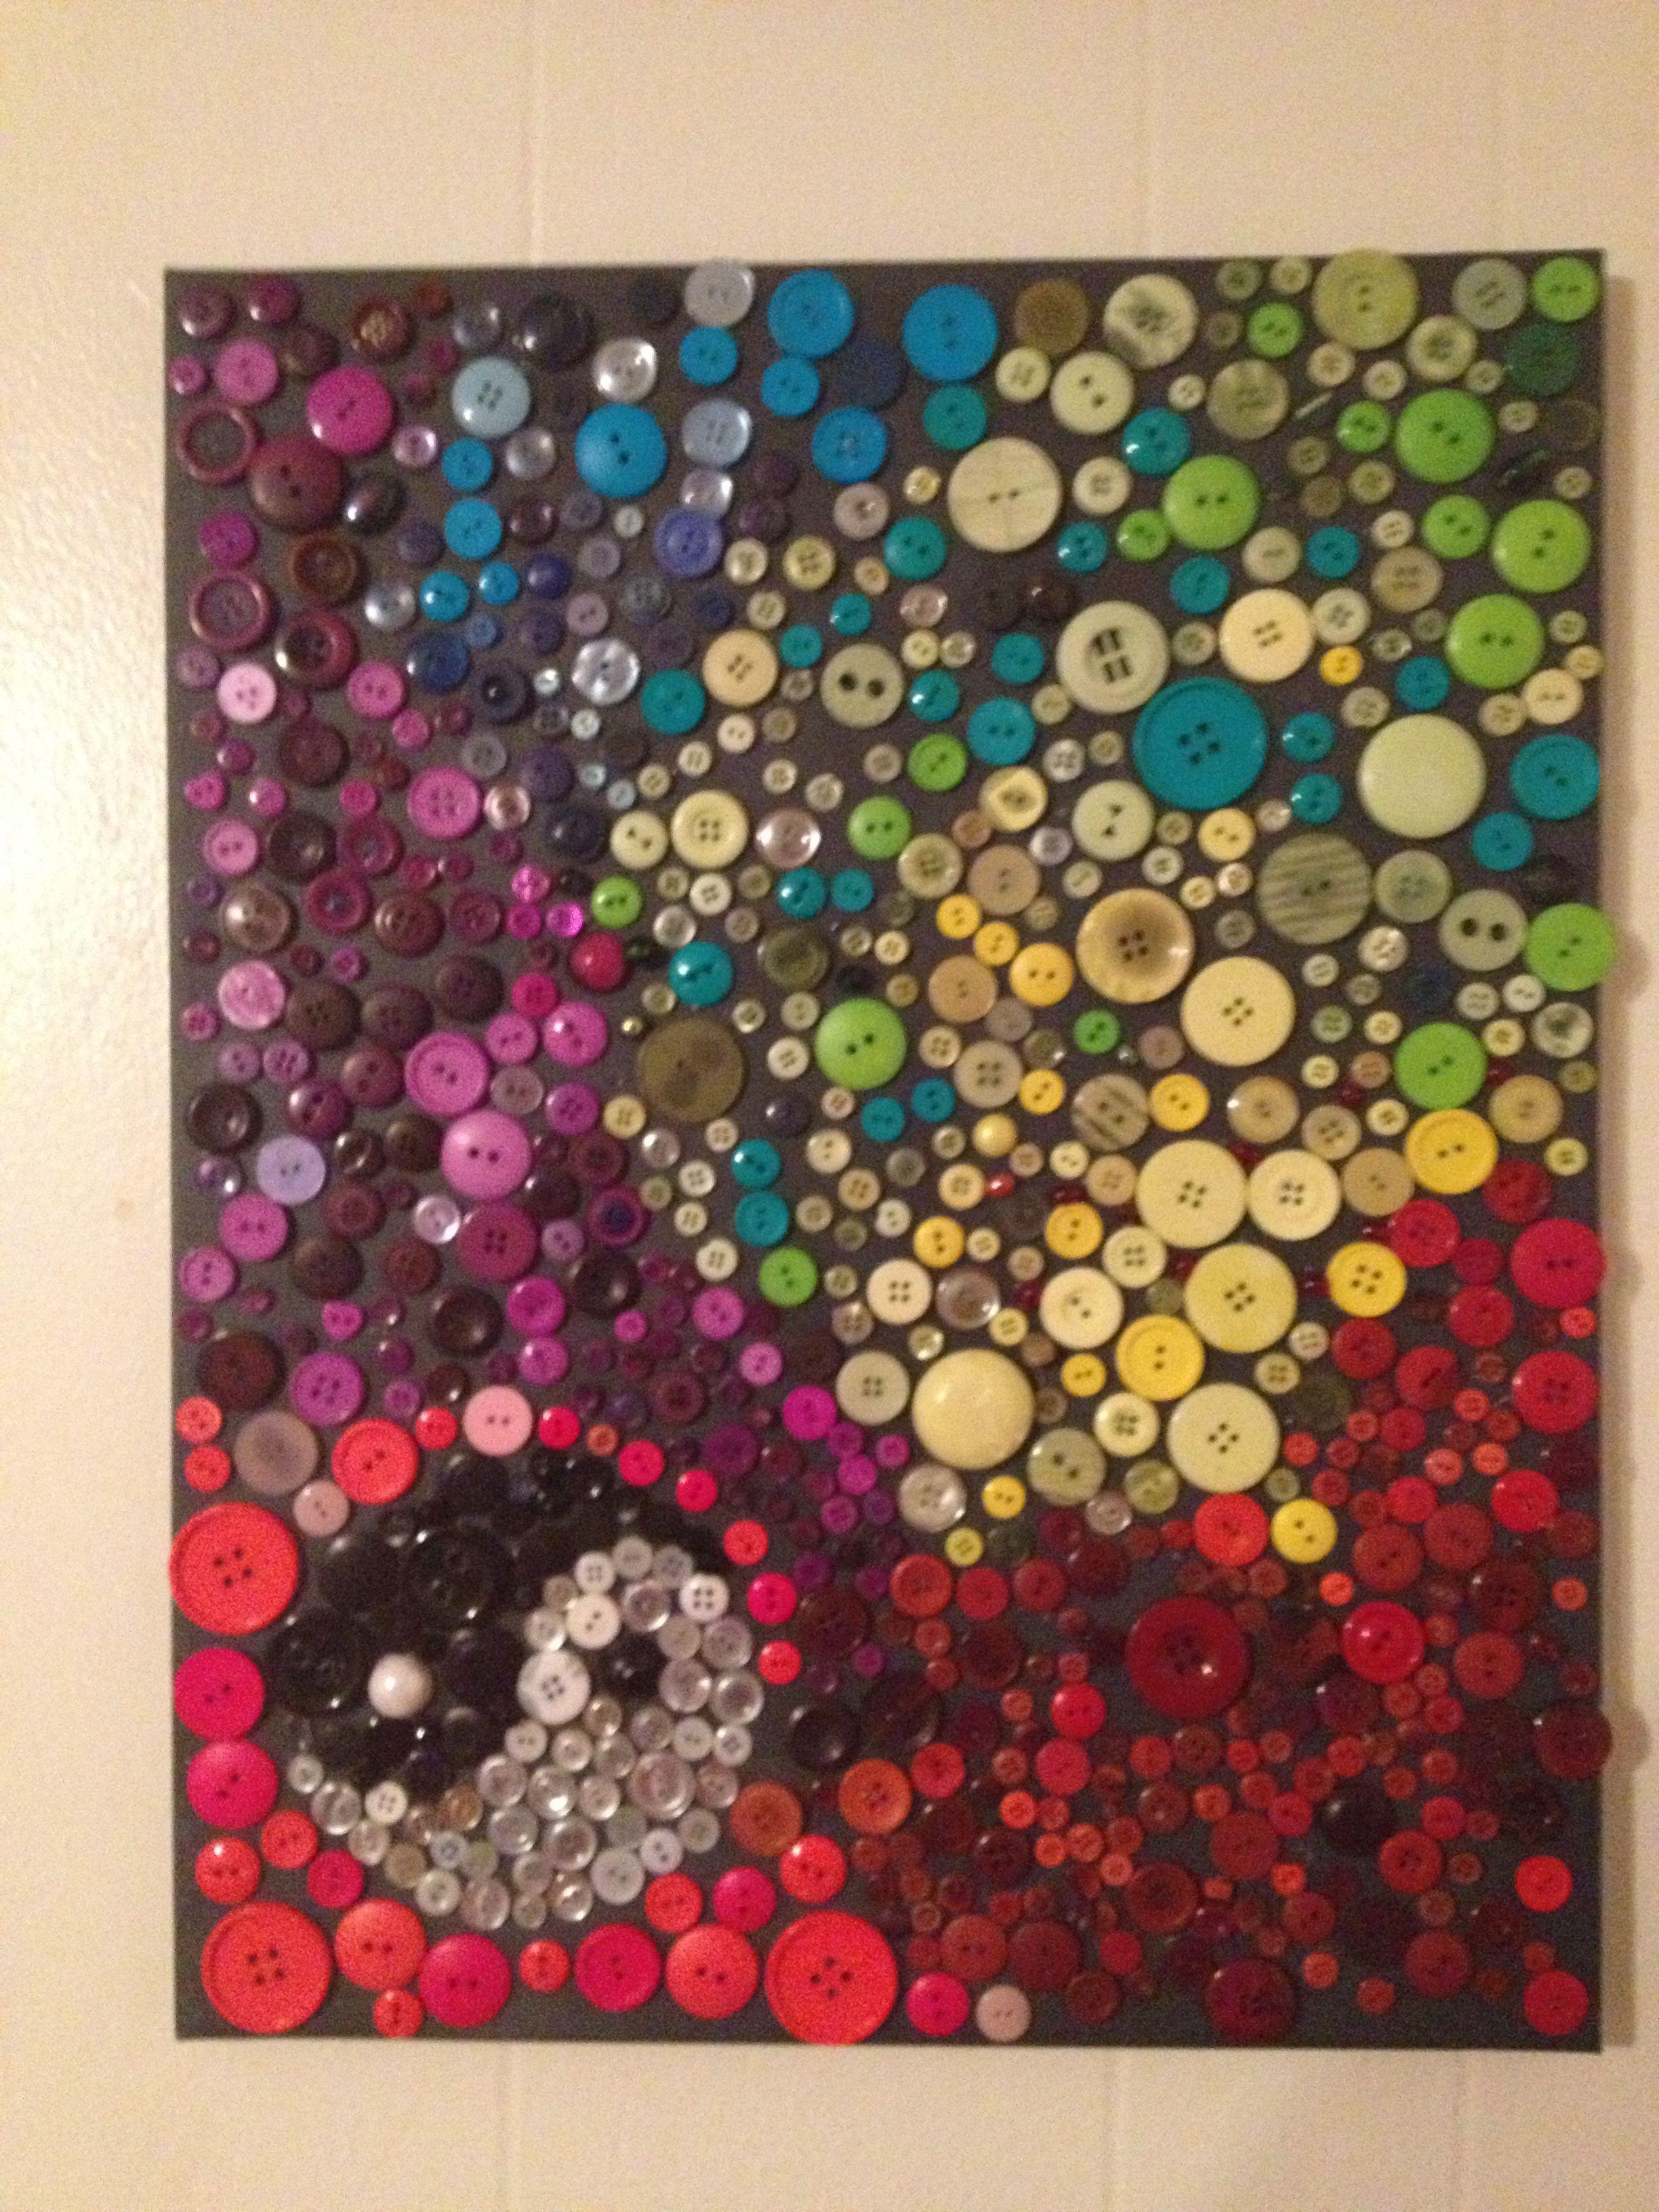 Mosaic using buttons Mosaic using buttons